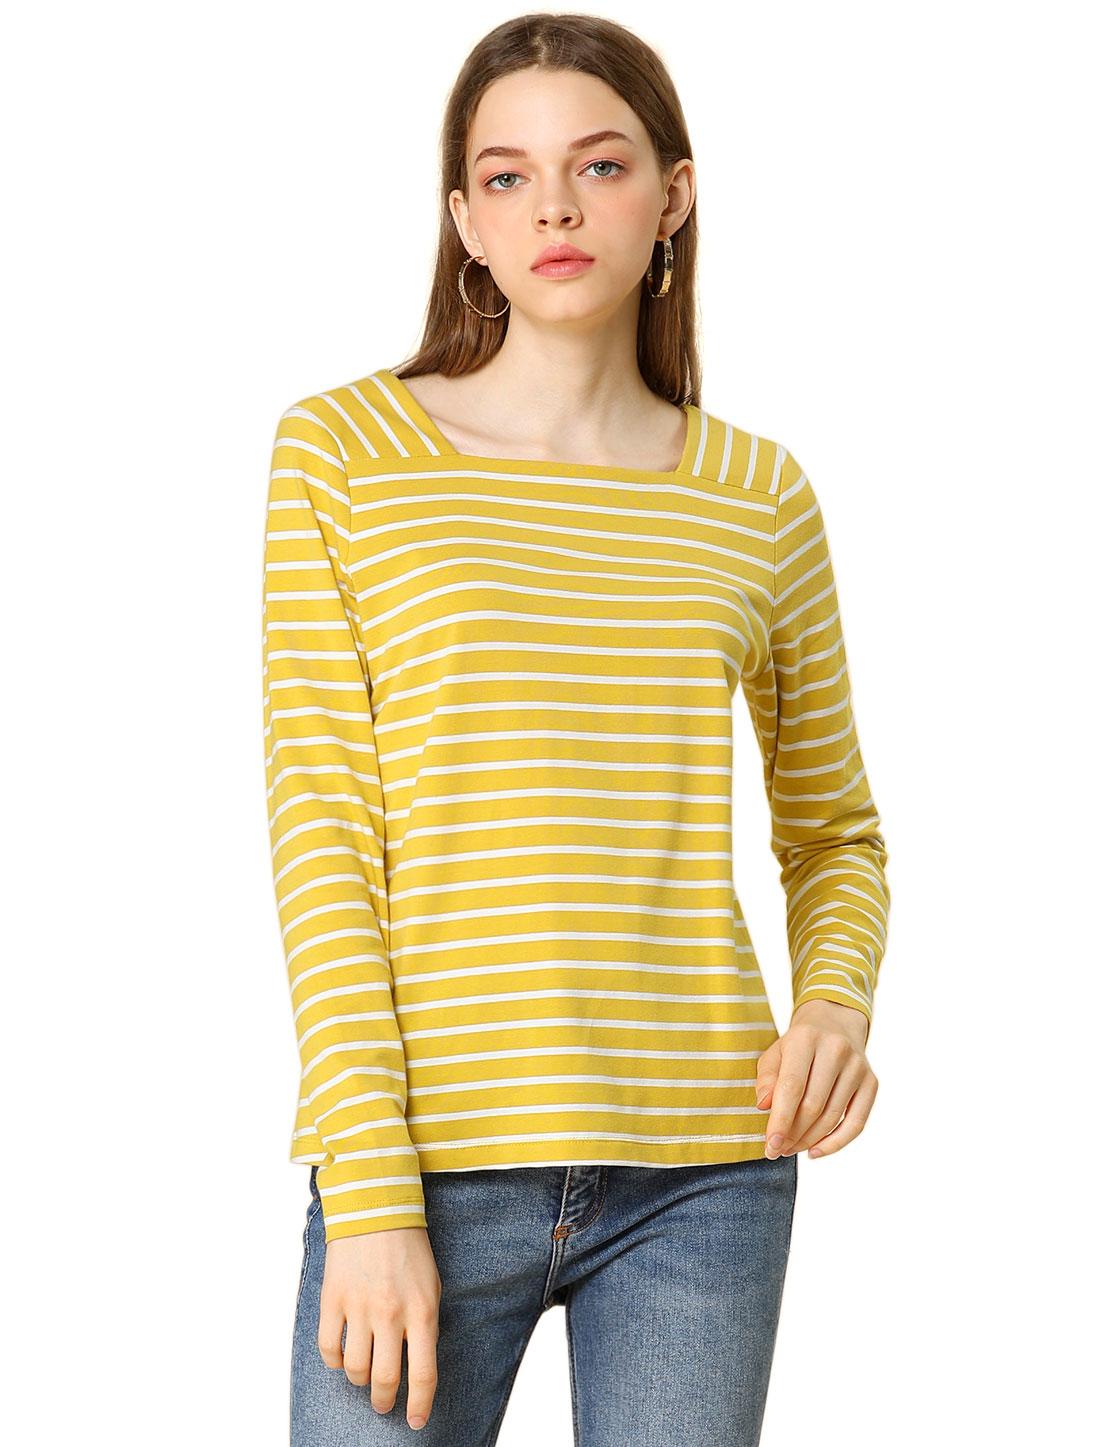 Allegra K Women's Long Sleeve Square Neck Striped T-Shirt Yellow XL